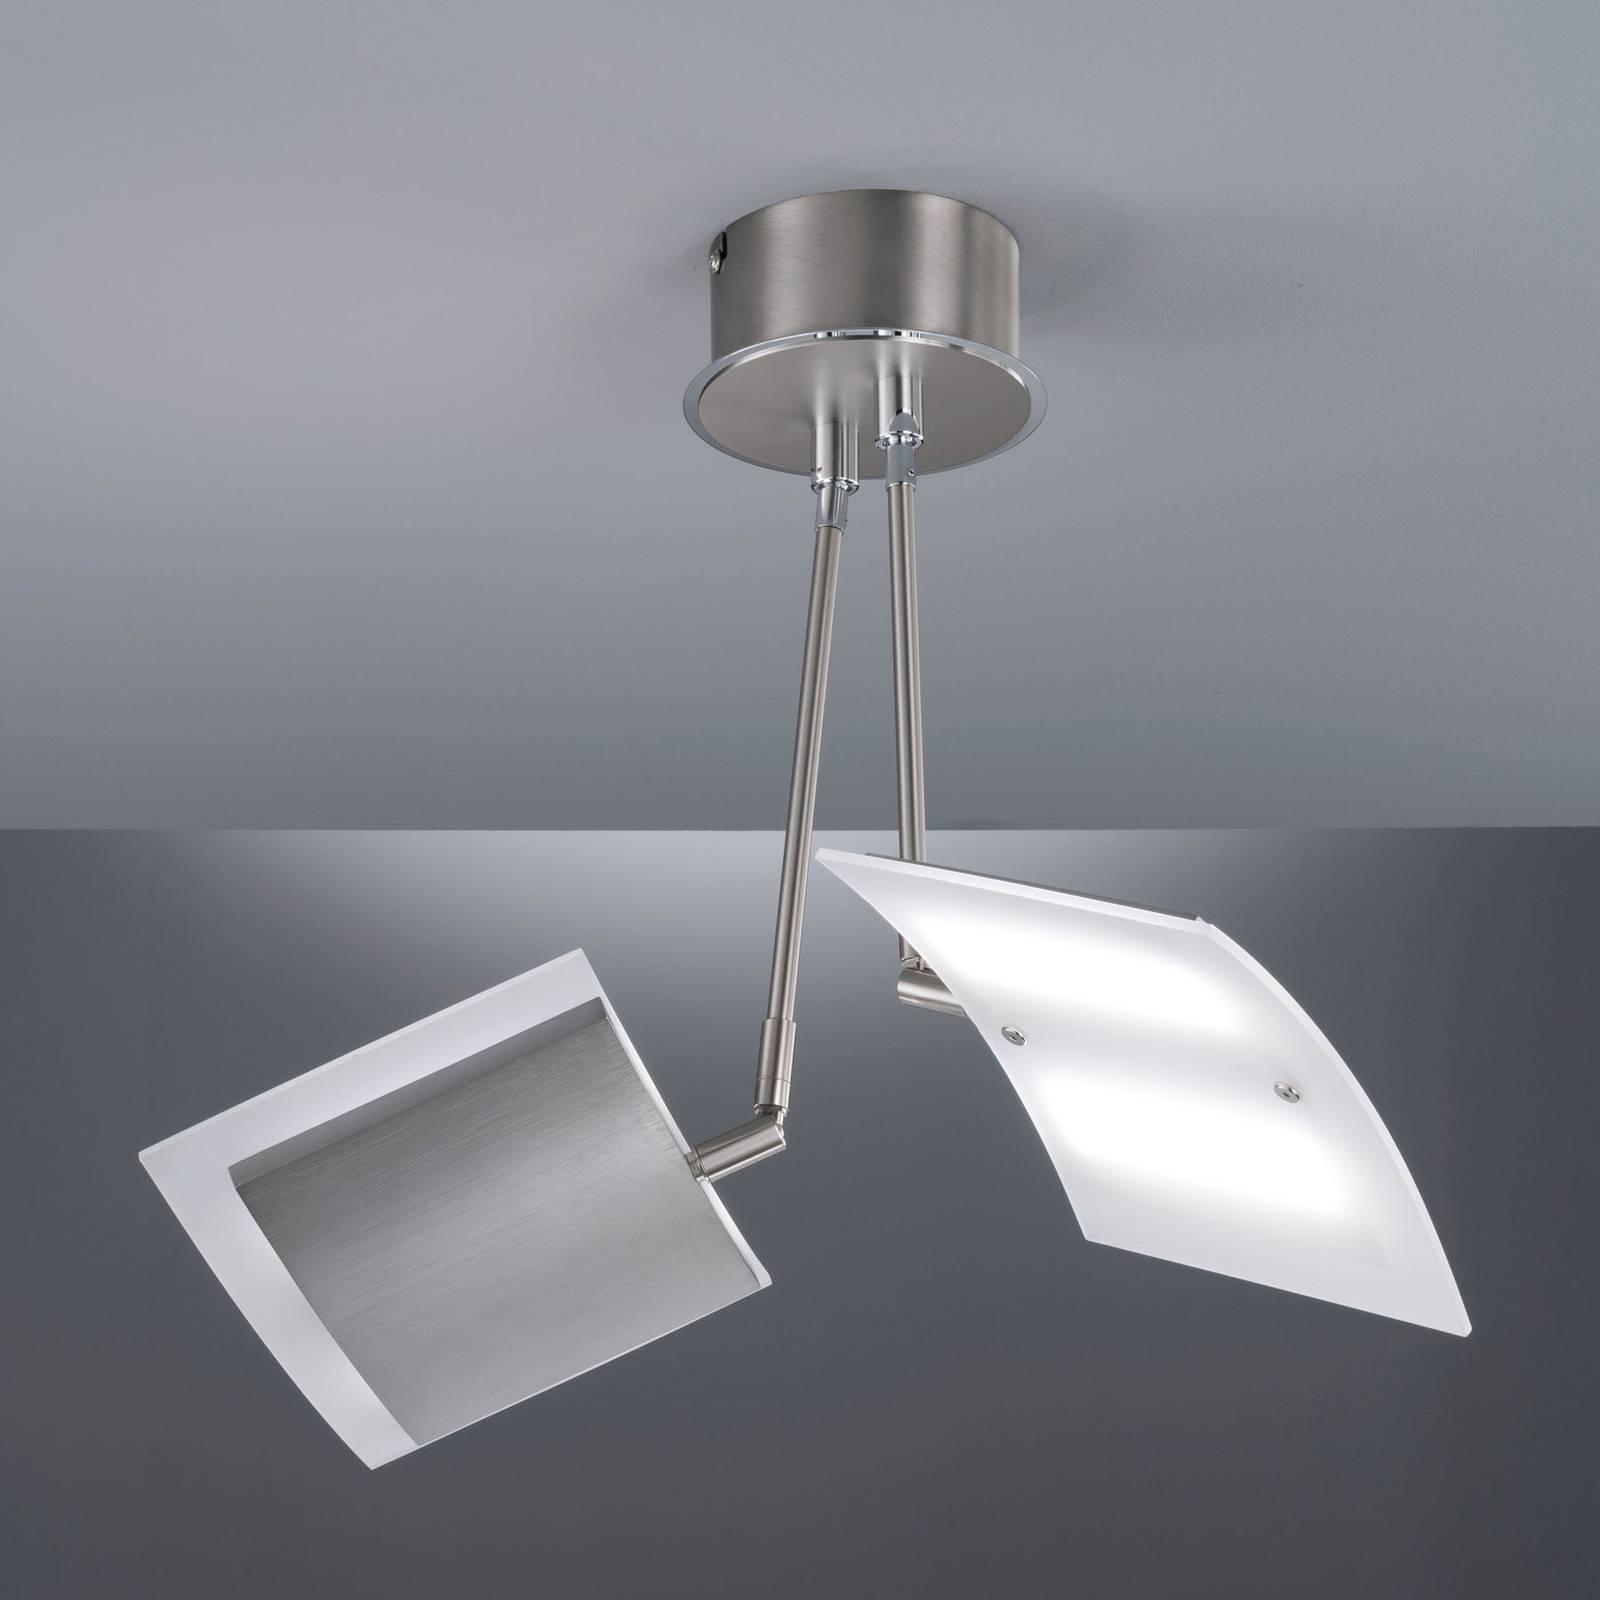 Lampa sufitowa LED Tours, z pilotem